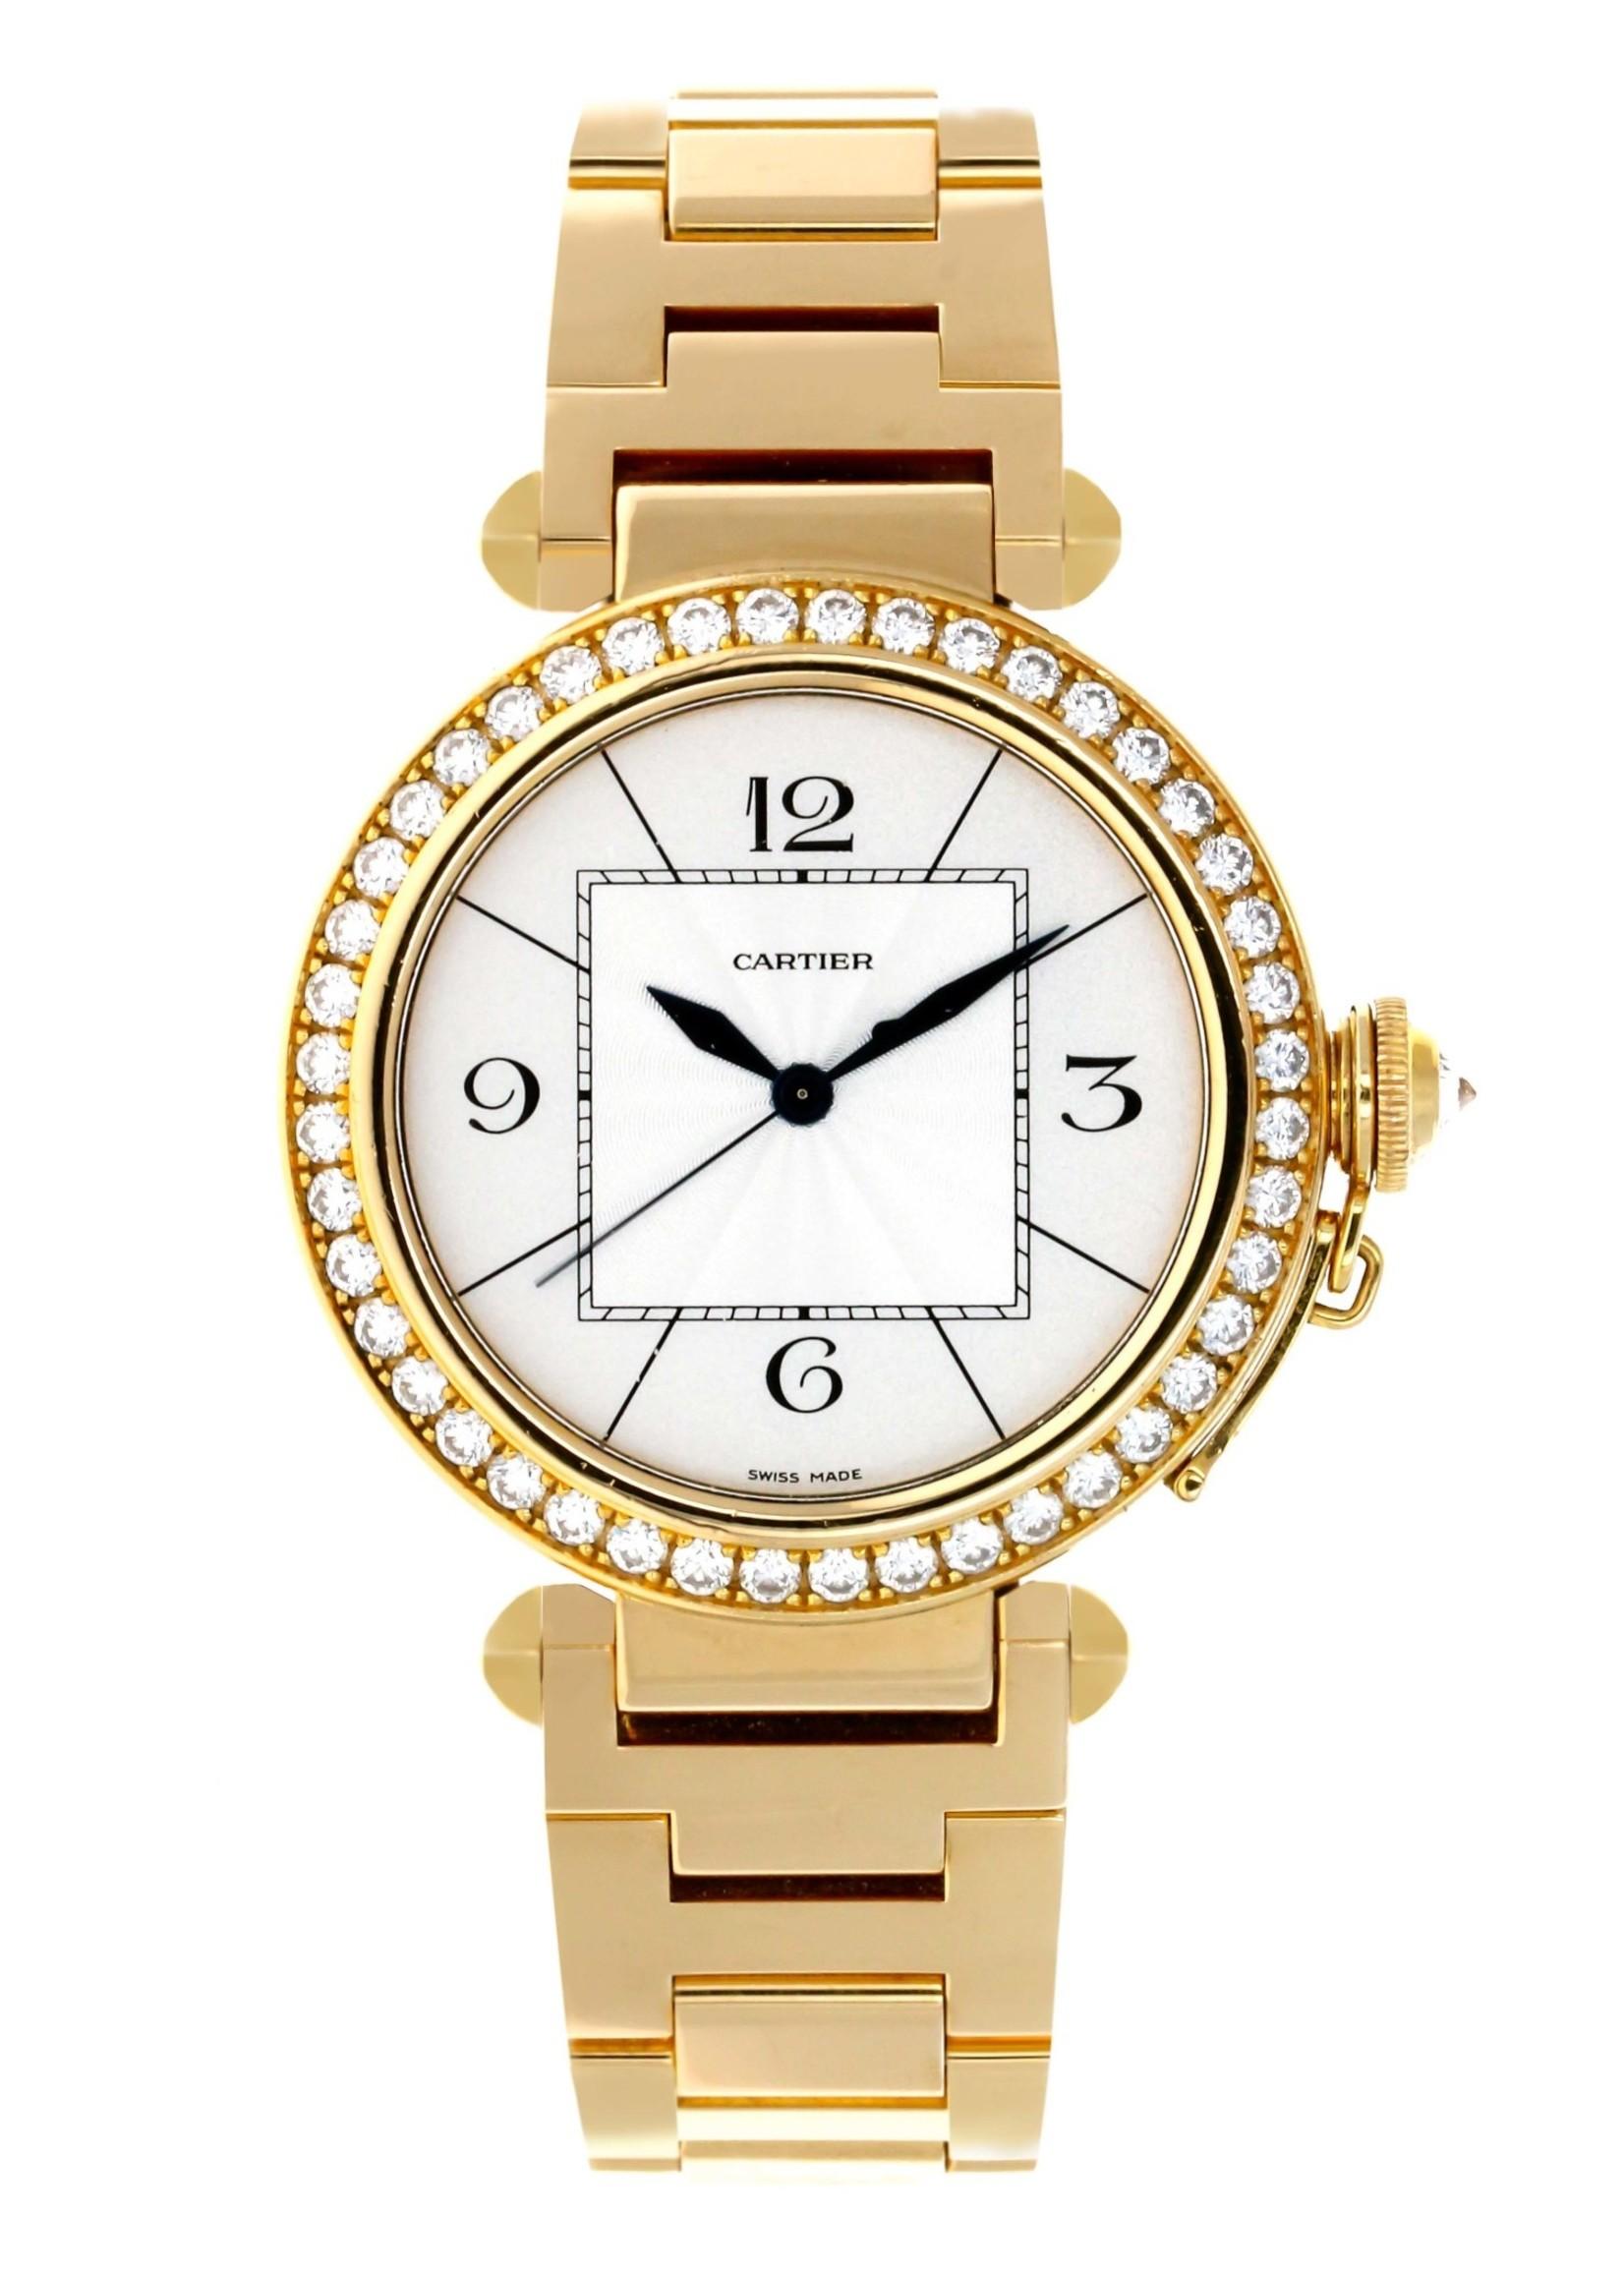 Cartier CARTIER PASHA 42MM 18K YELLOW GOLD AUTOMATIC #2726